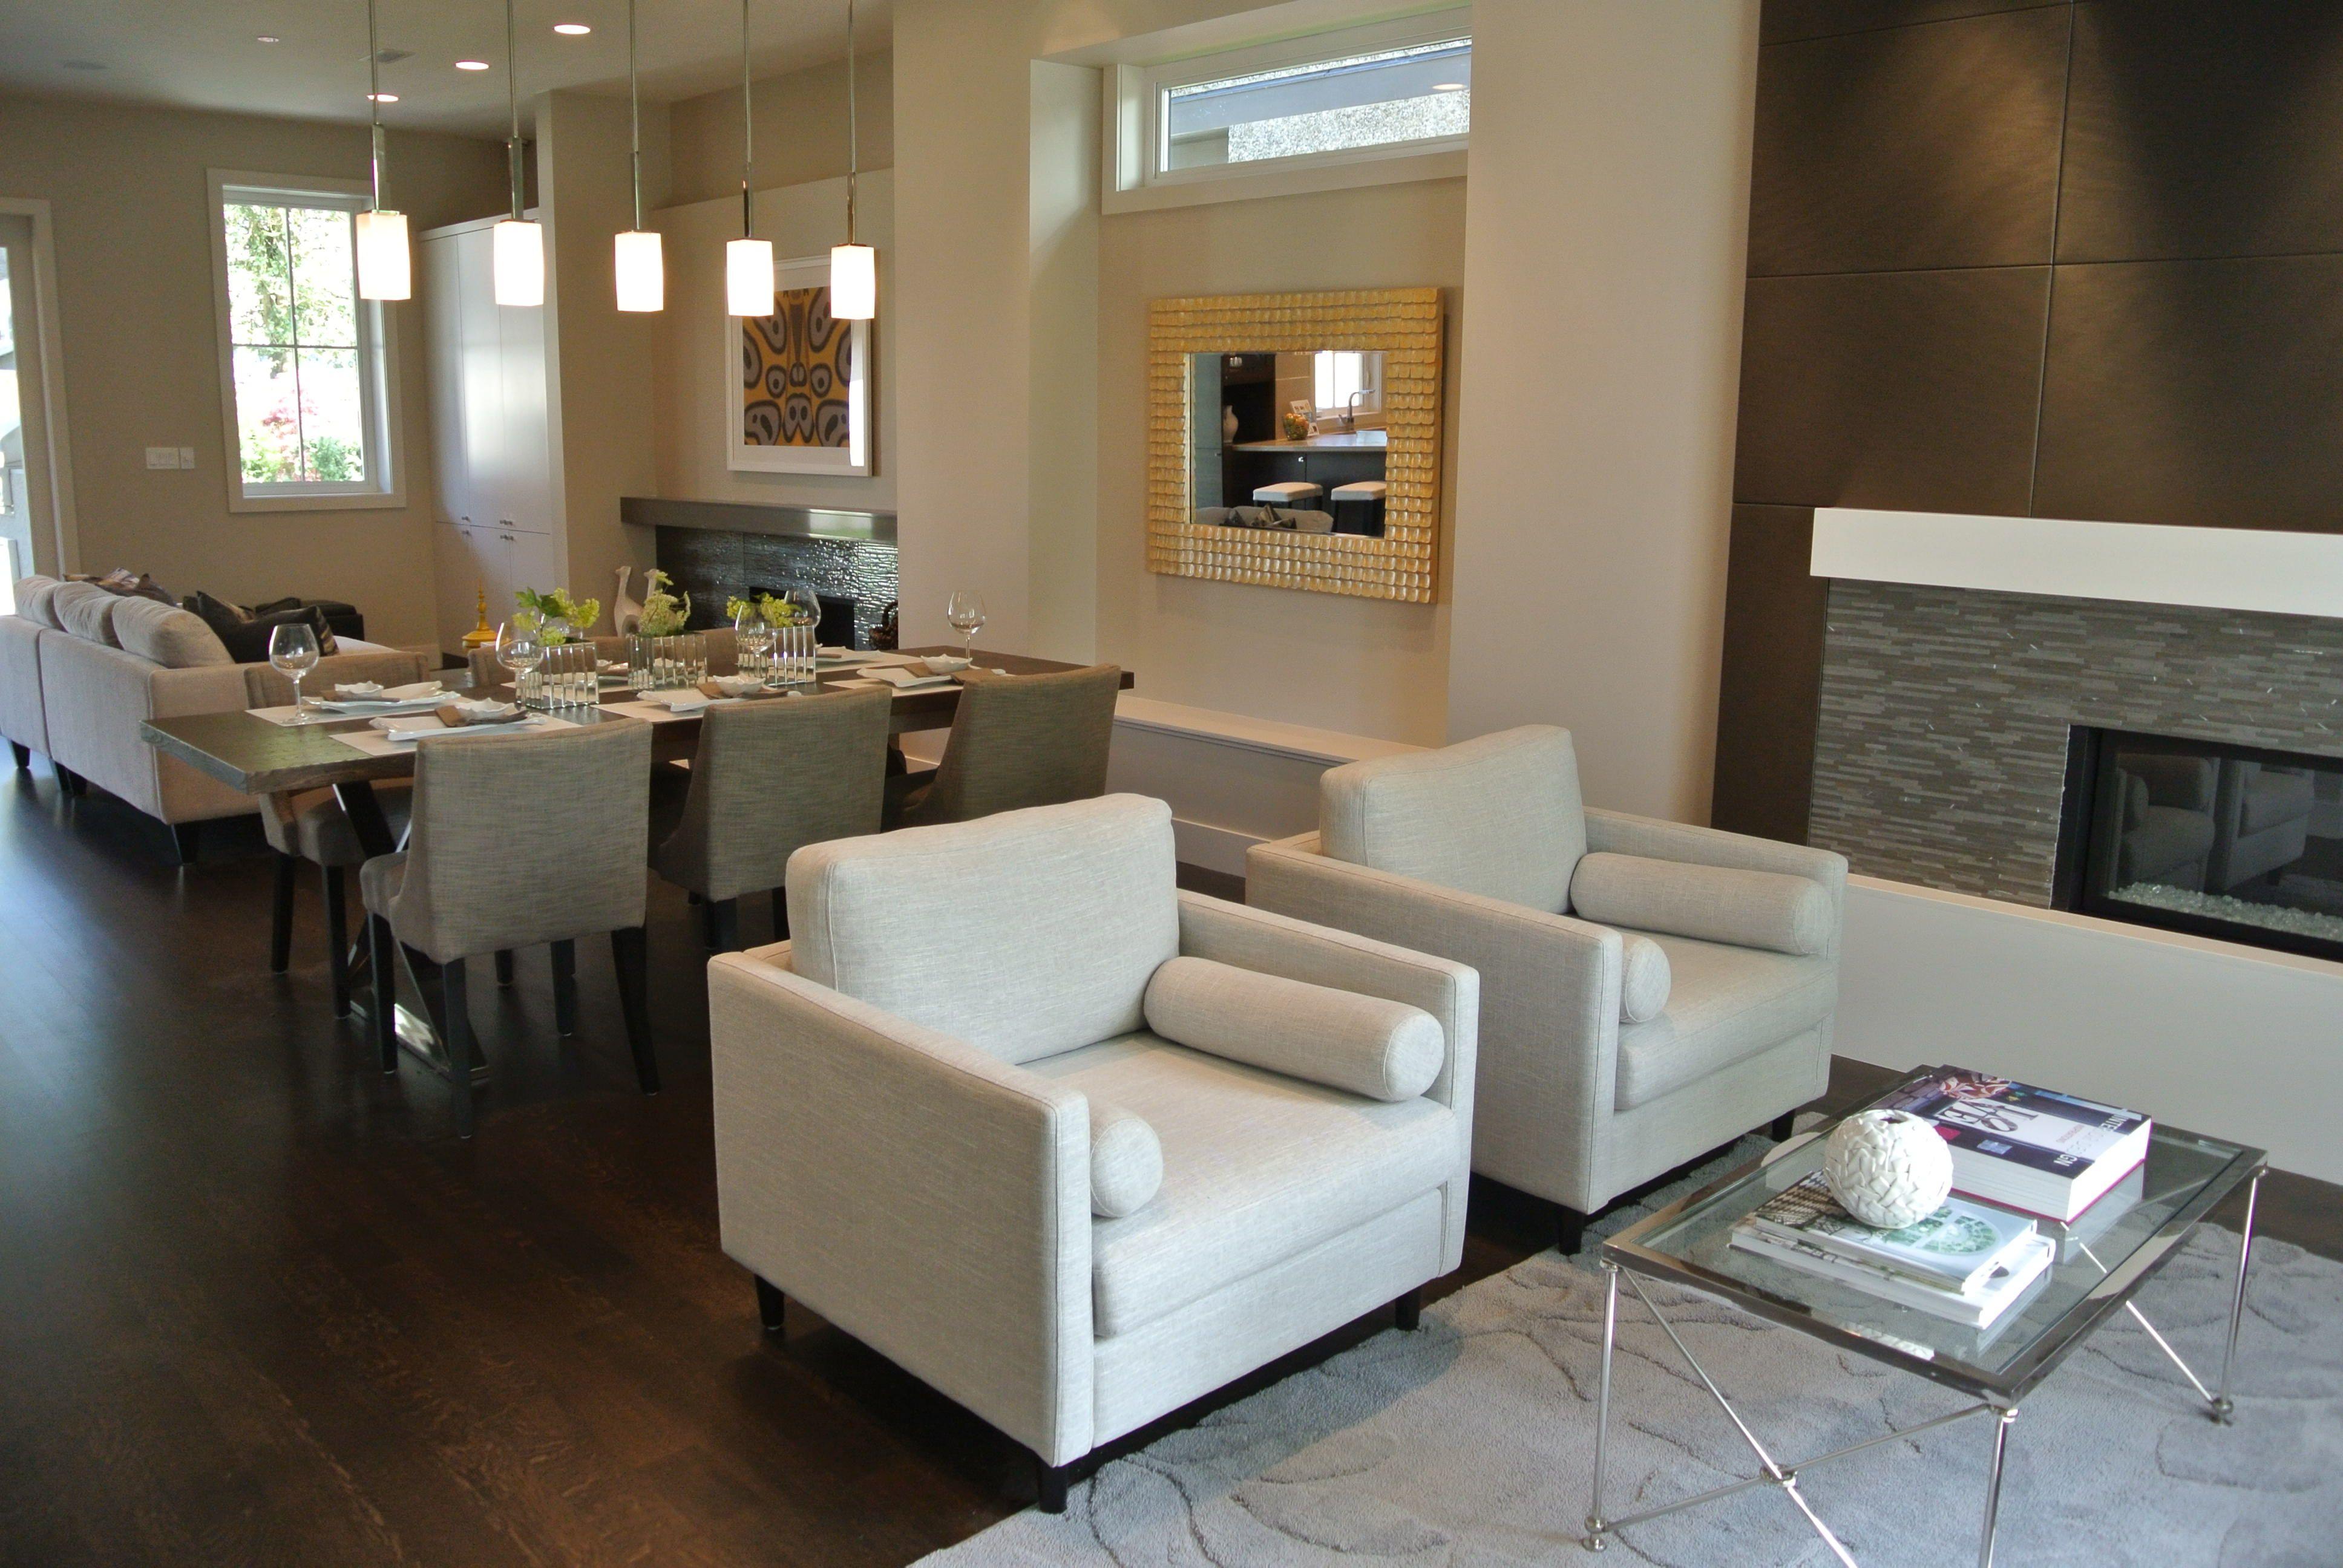 Van Gogh Lindley Chairs Space Created By Home Ingredients Design!